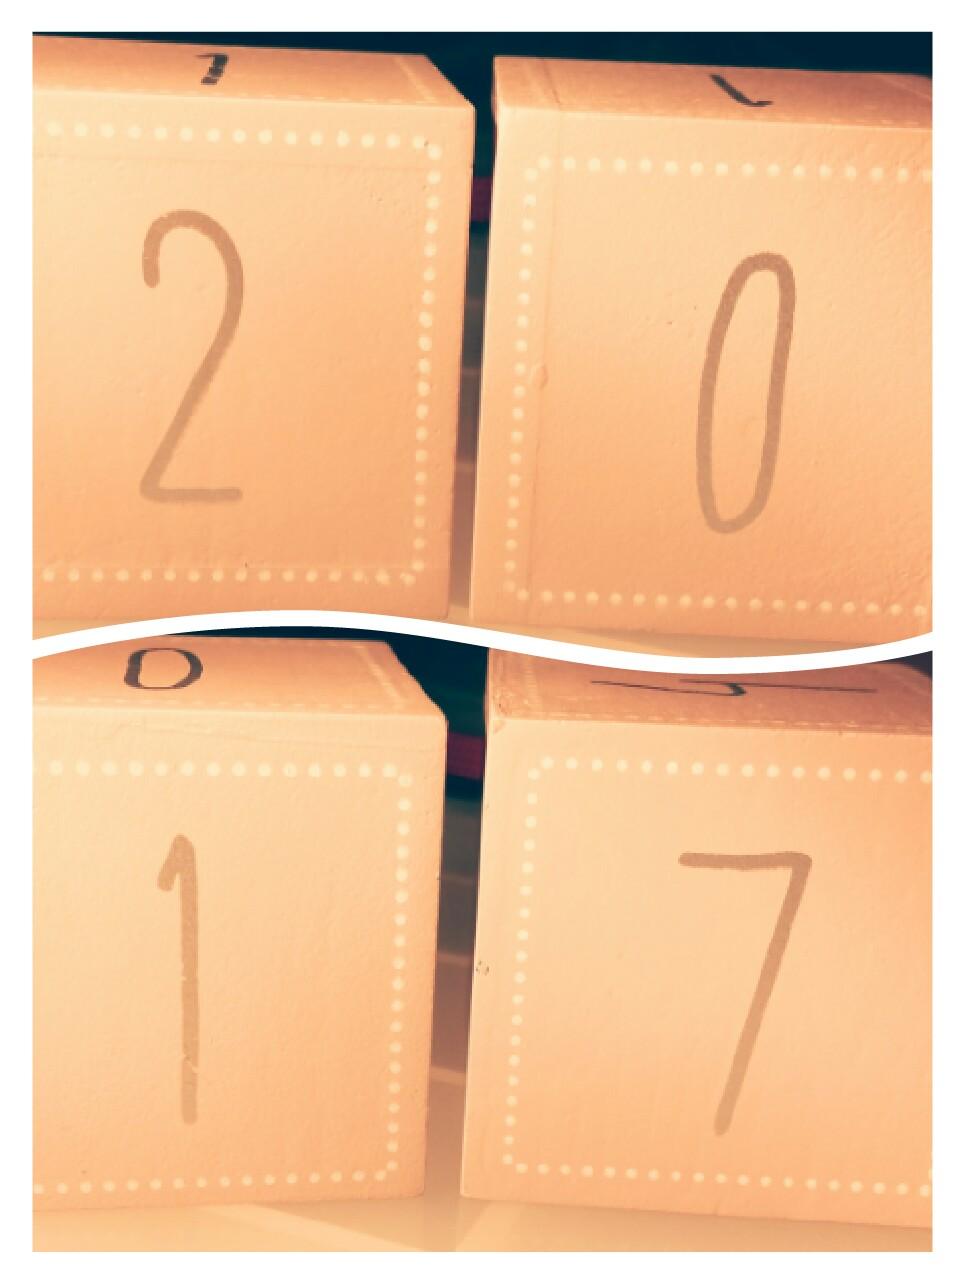 collage-1515941183940.jpg